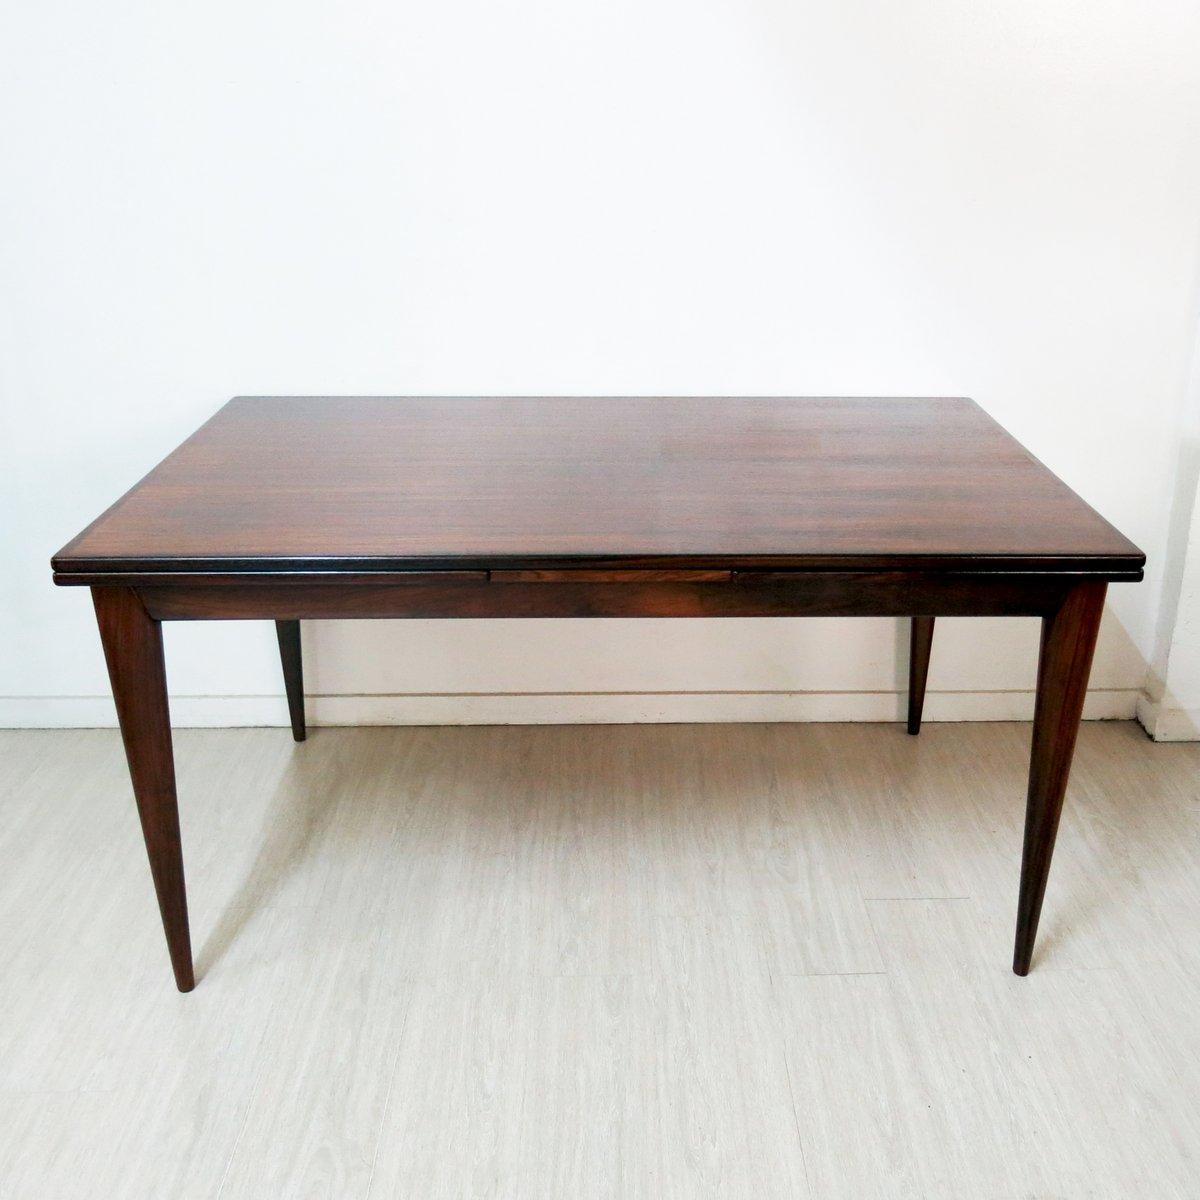 modell 12 palisander esstisch von niels o m ller f r j l m ller m belfabrik 1960er bei pamono. Black Bedroom Furniture Sets. Home Design Ideas